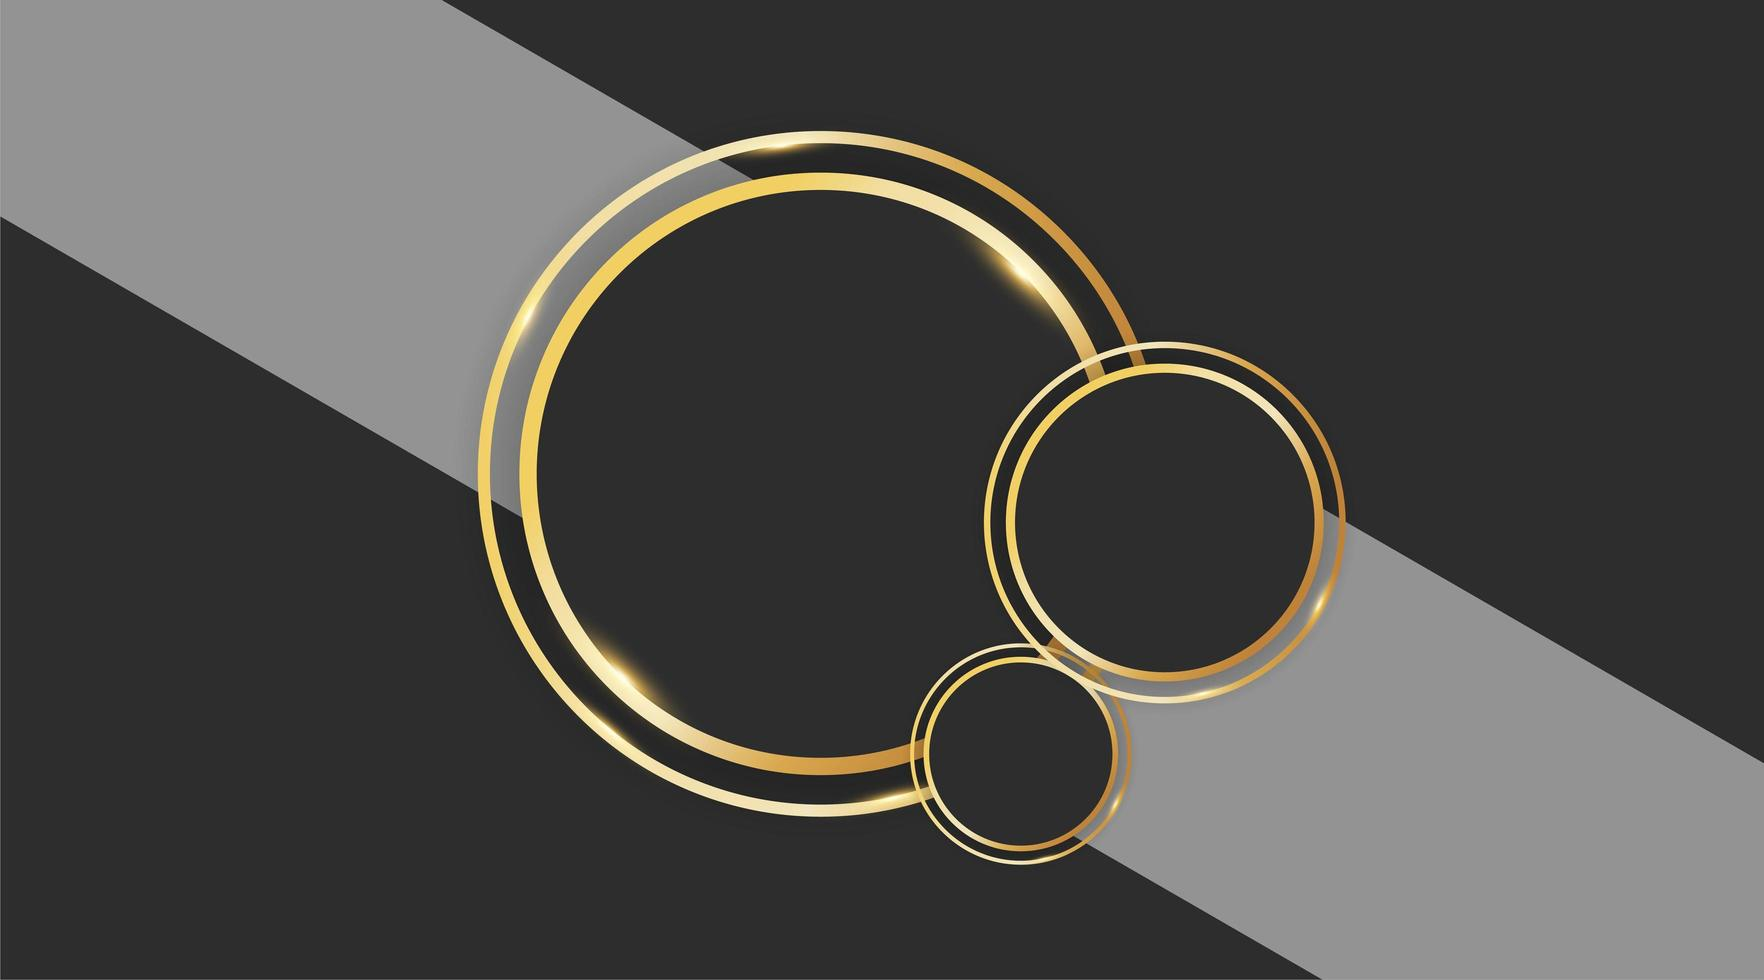 Diseño de vector de círculo abstracto con anillo de oro sobre fondo gris